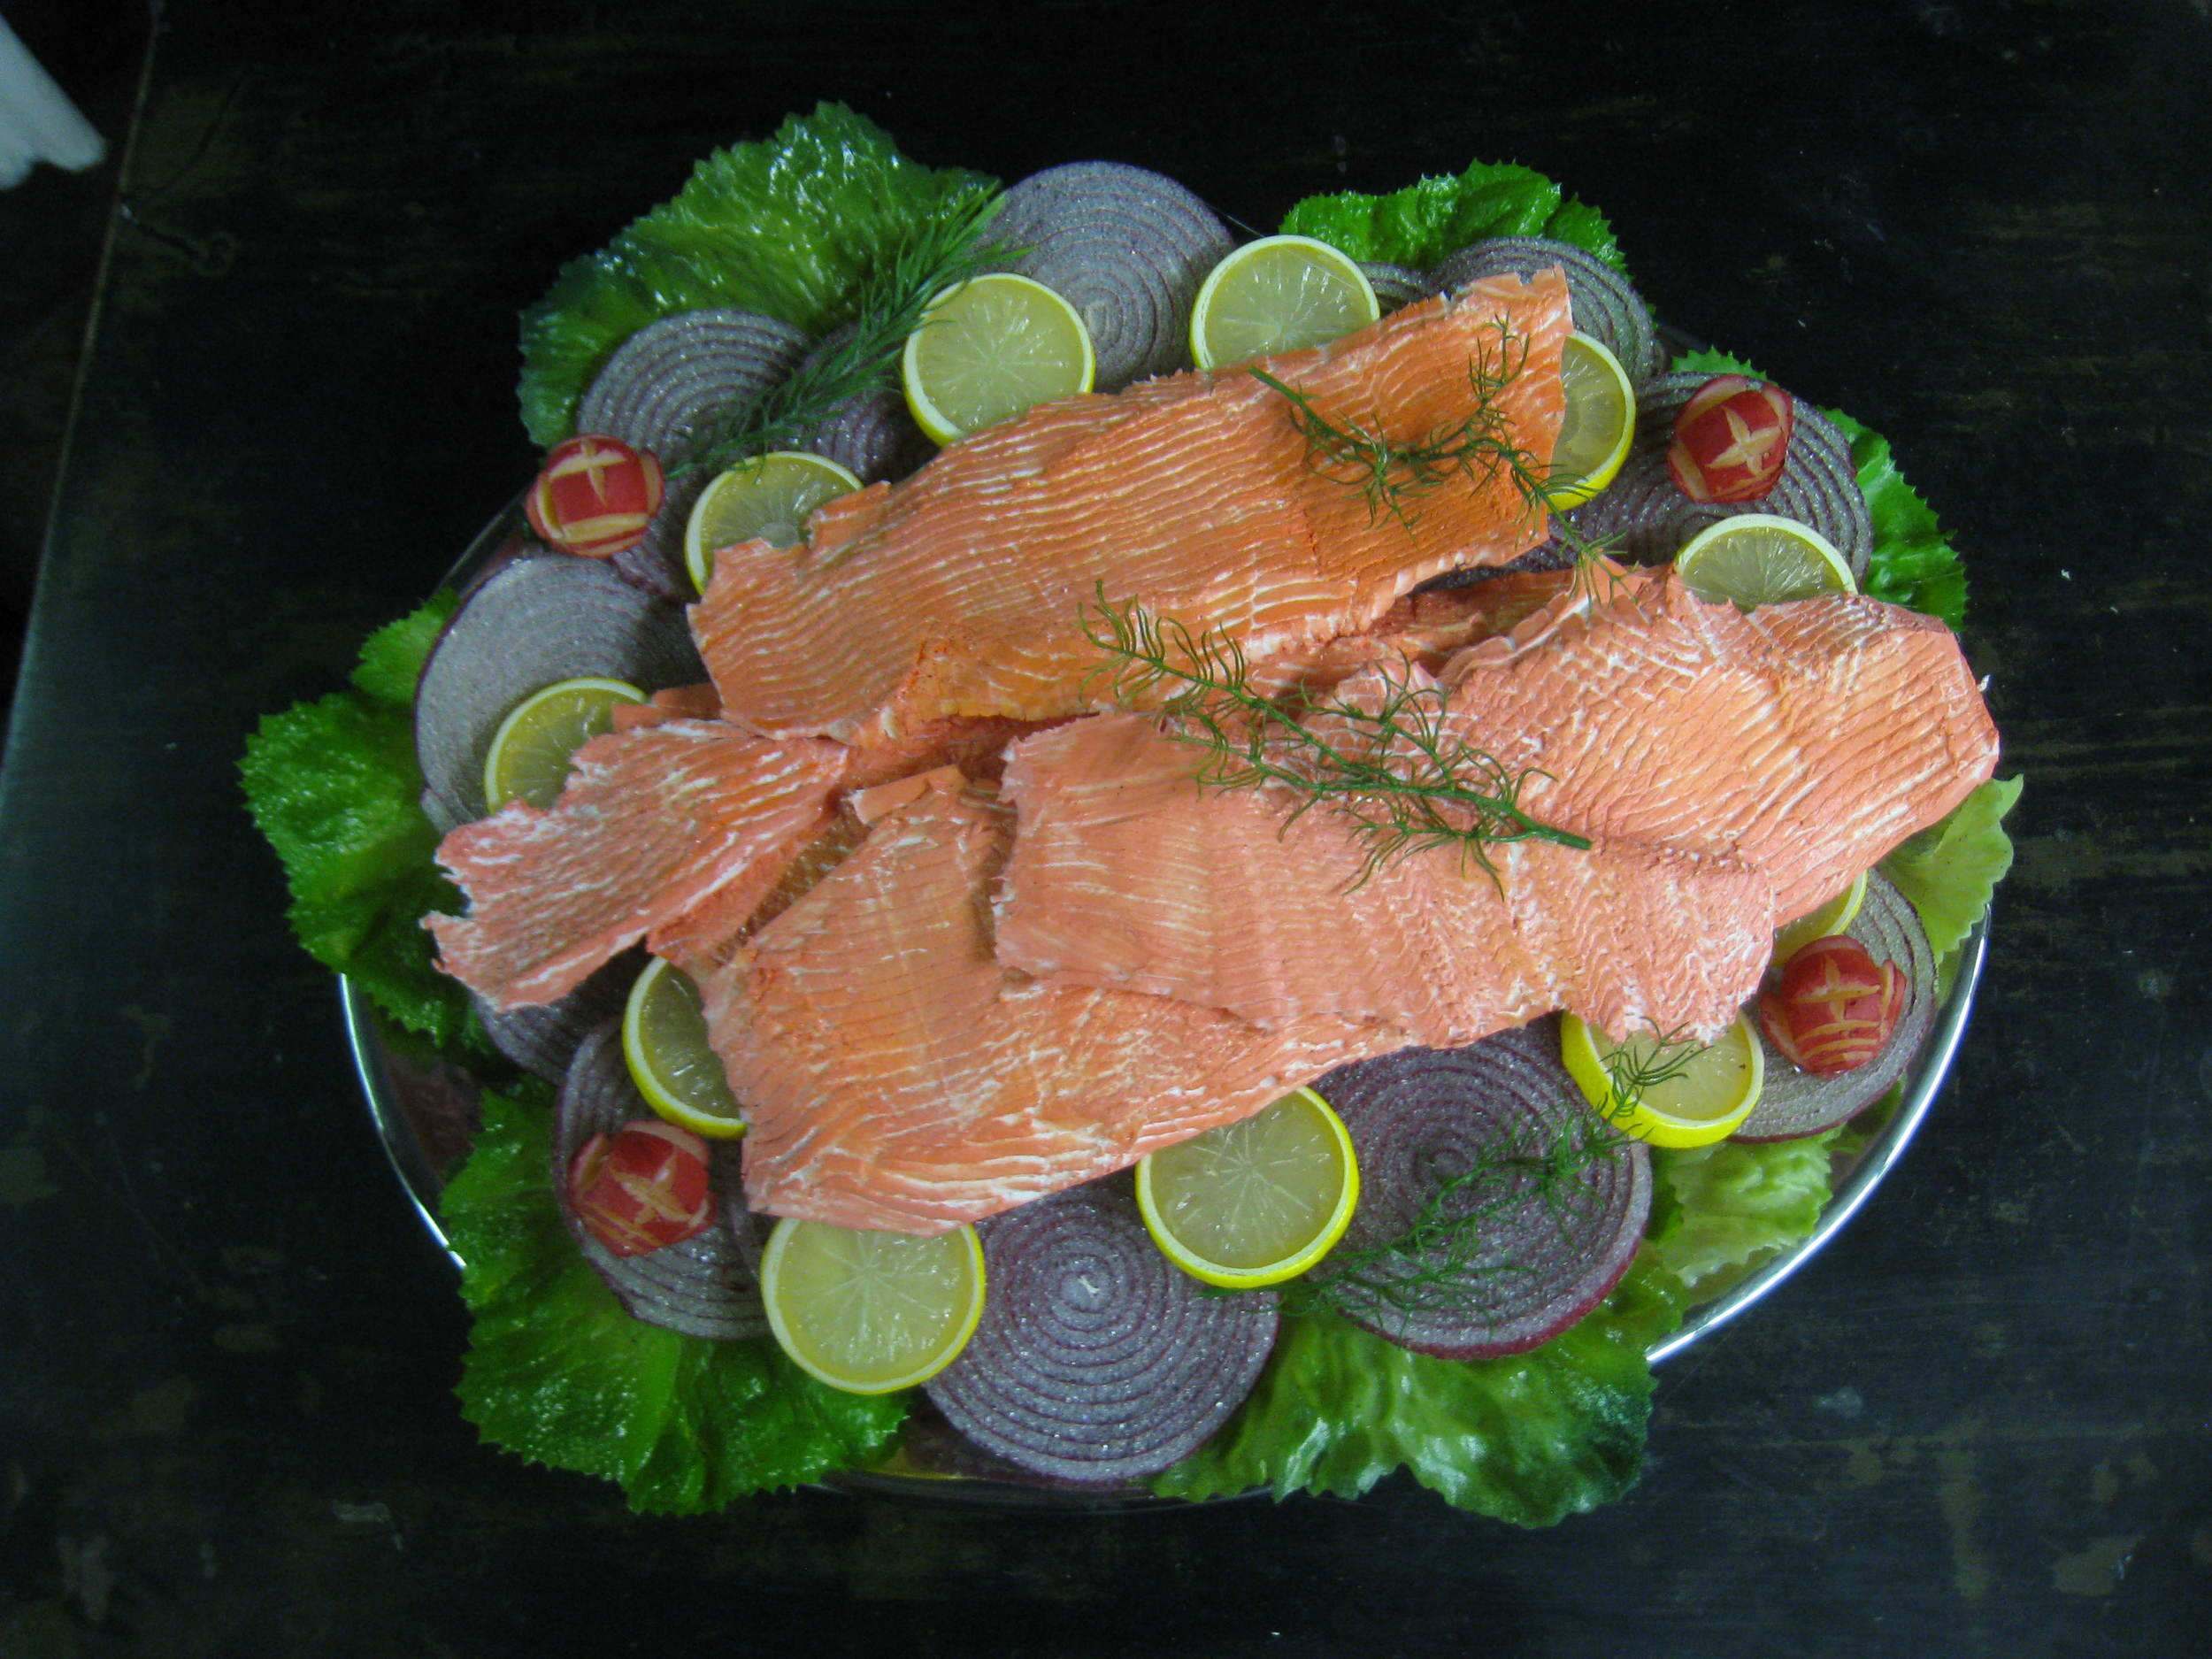 Fish in the Dark Salmon Plate